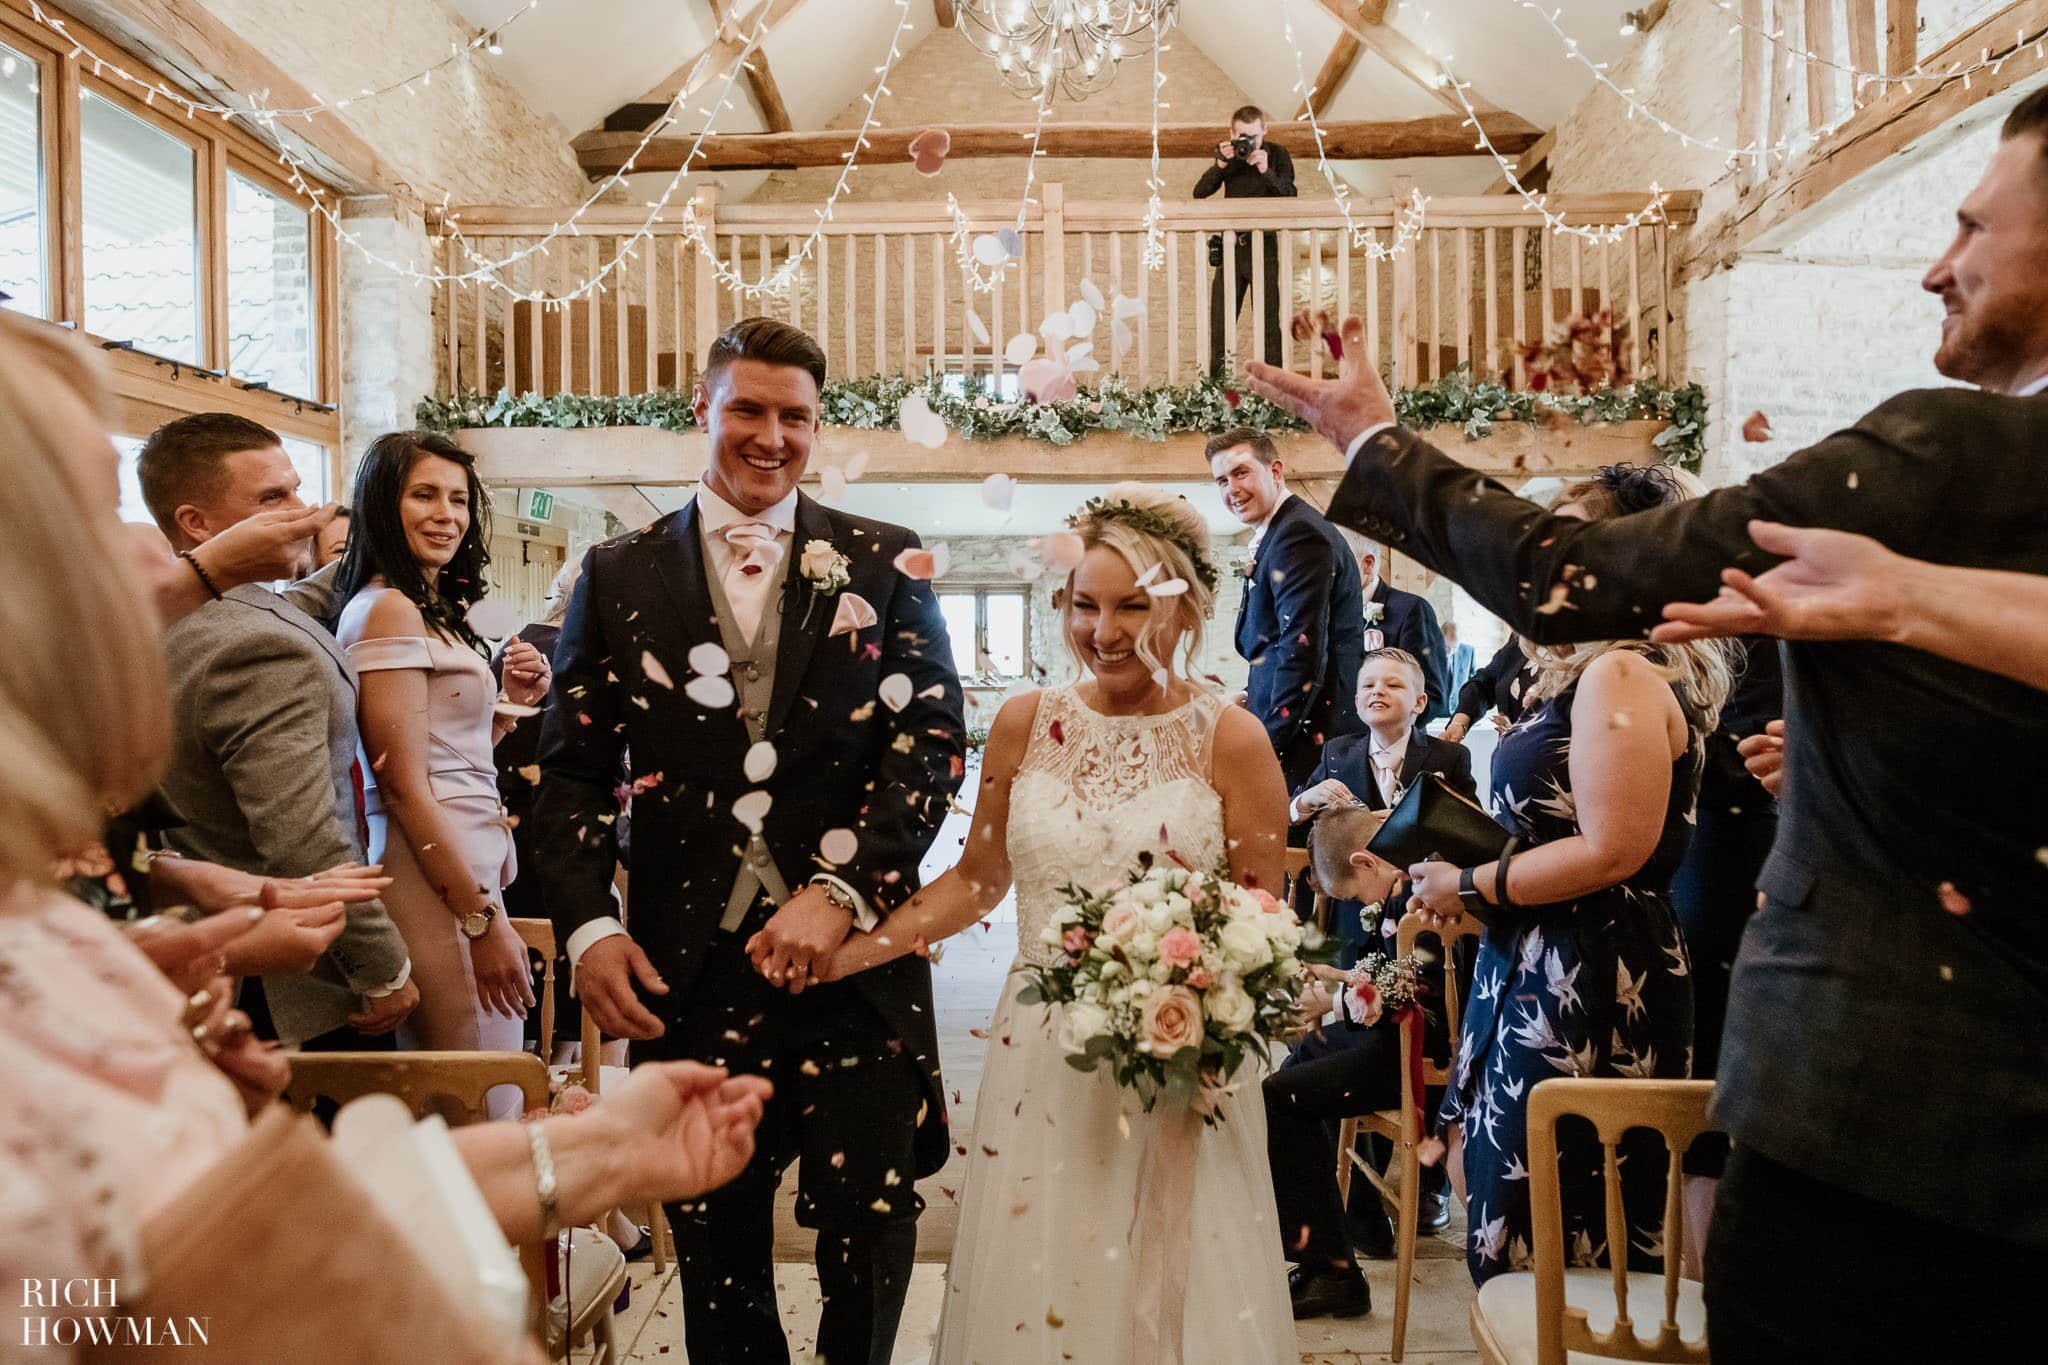 Kingscote Barn Wedding Photographer in Gloucestershire 550